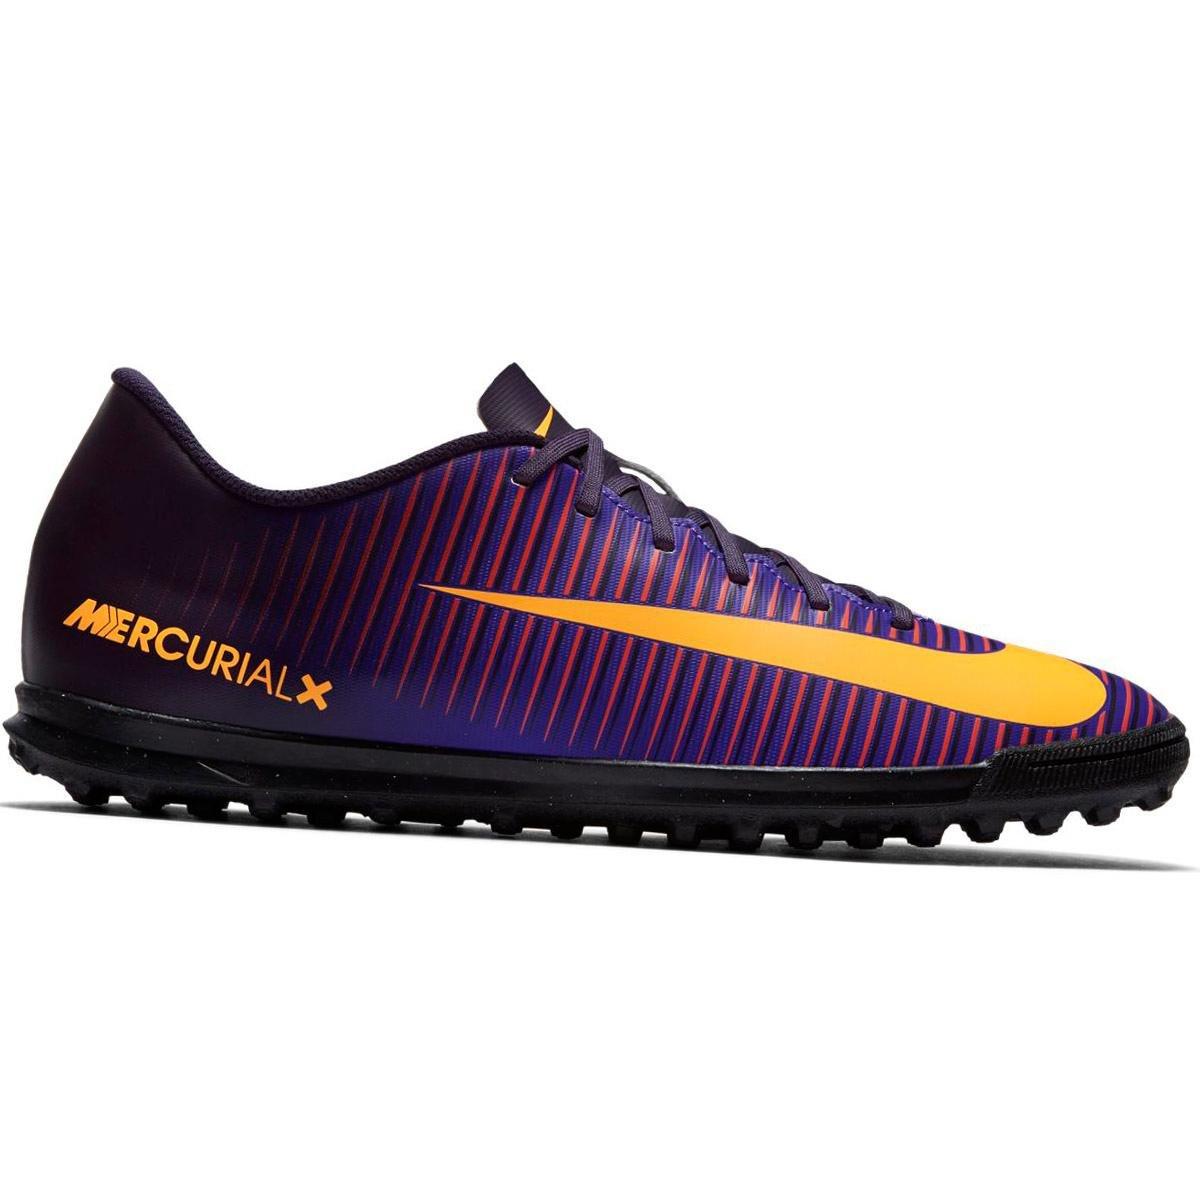 4854f287e0 Chuteira Society Nike Mercurial Vortex III TF - Compre Agora